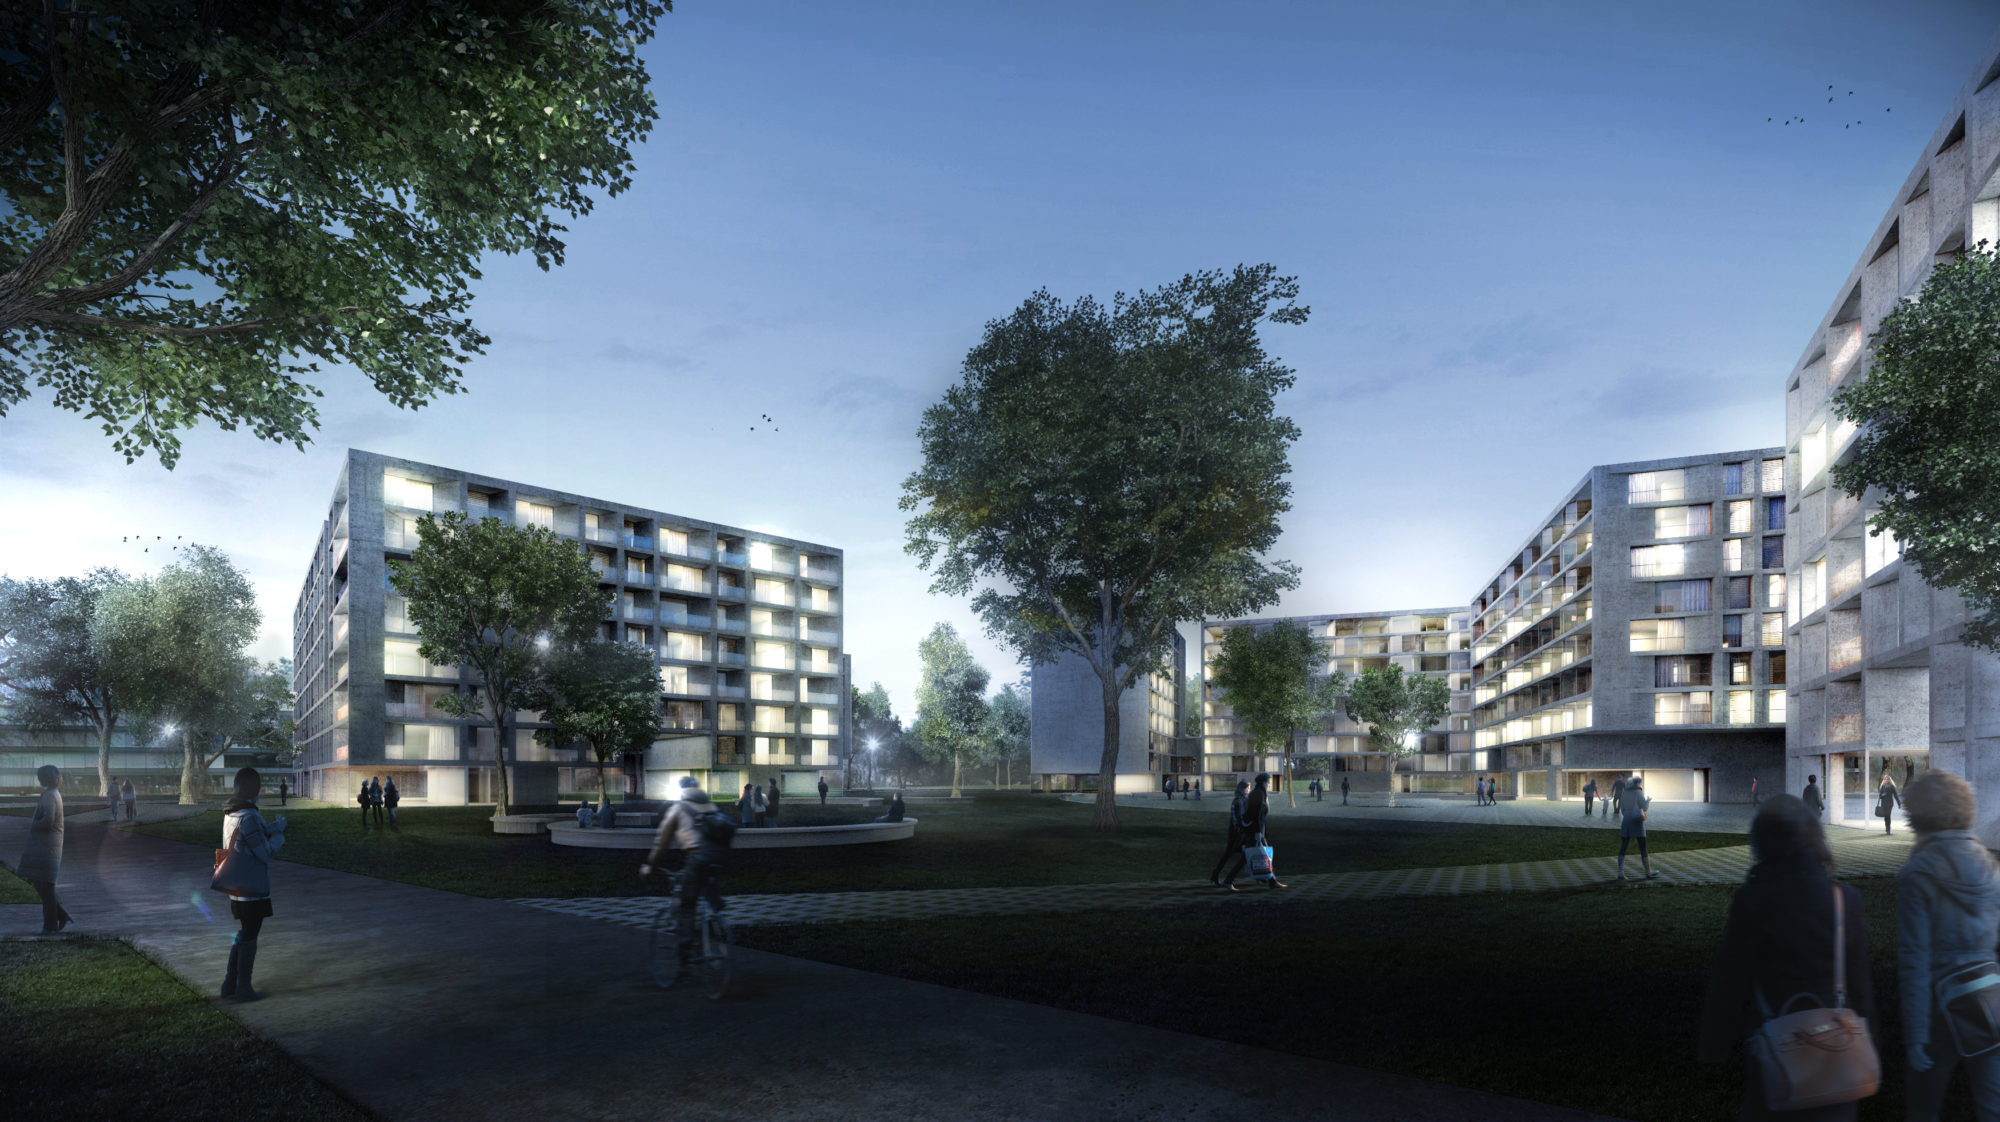 Viviendas en Carouge - Garcés - de Seta - Bonet